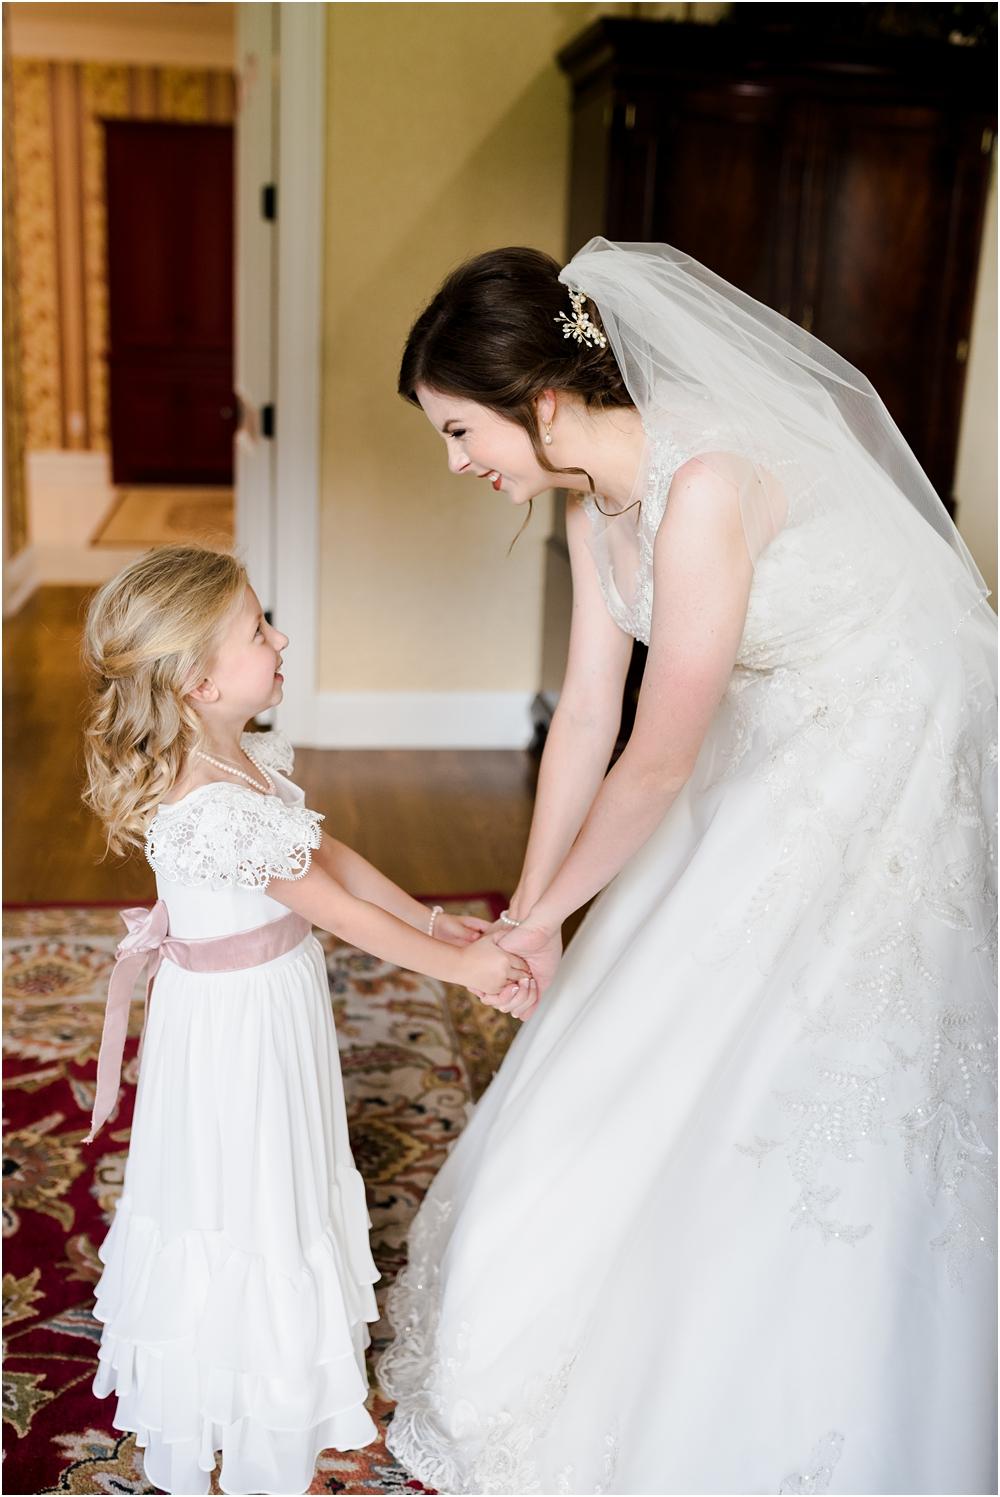 marianna-florida-wedding-photographer-kiersten-grant-103.jpg